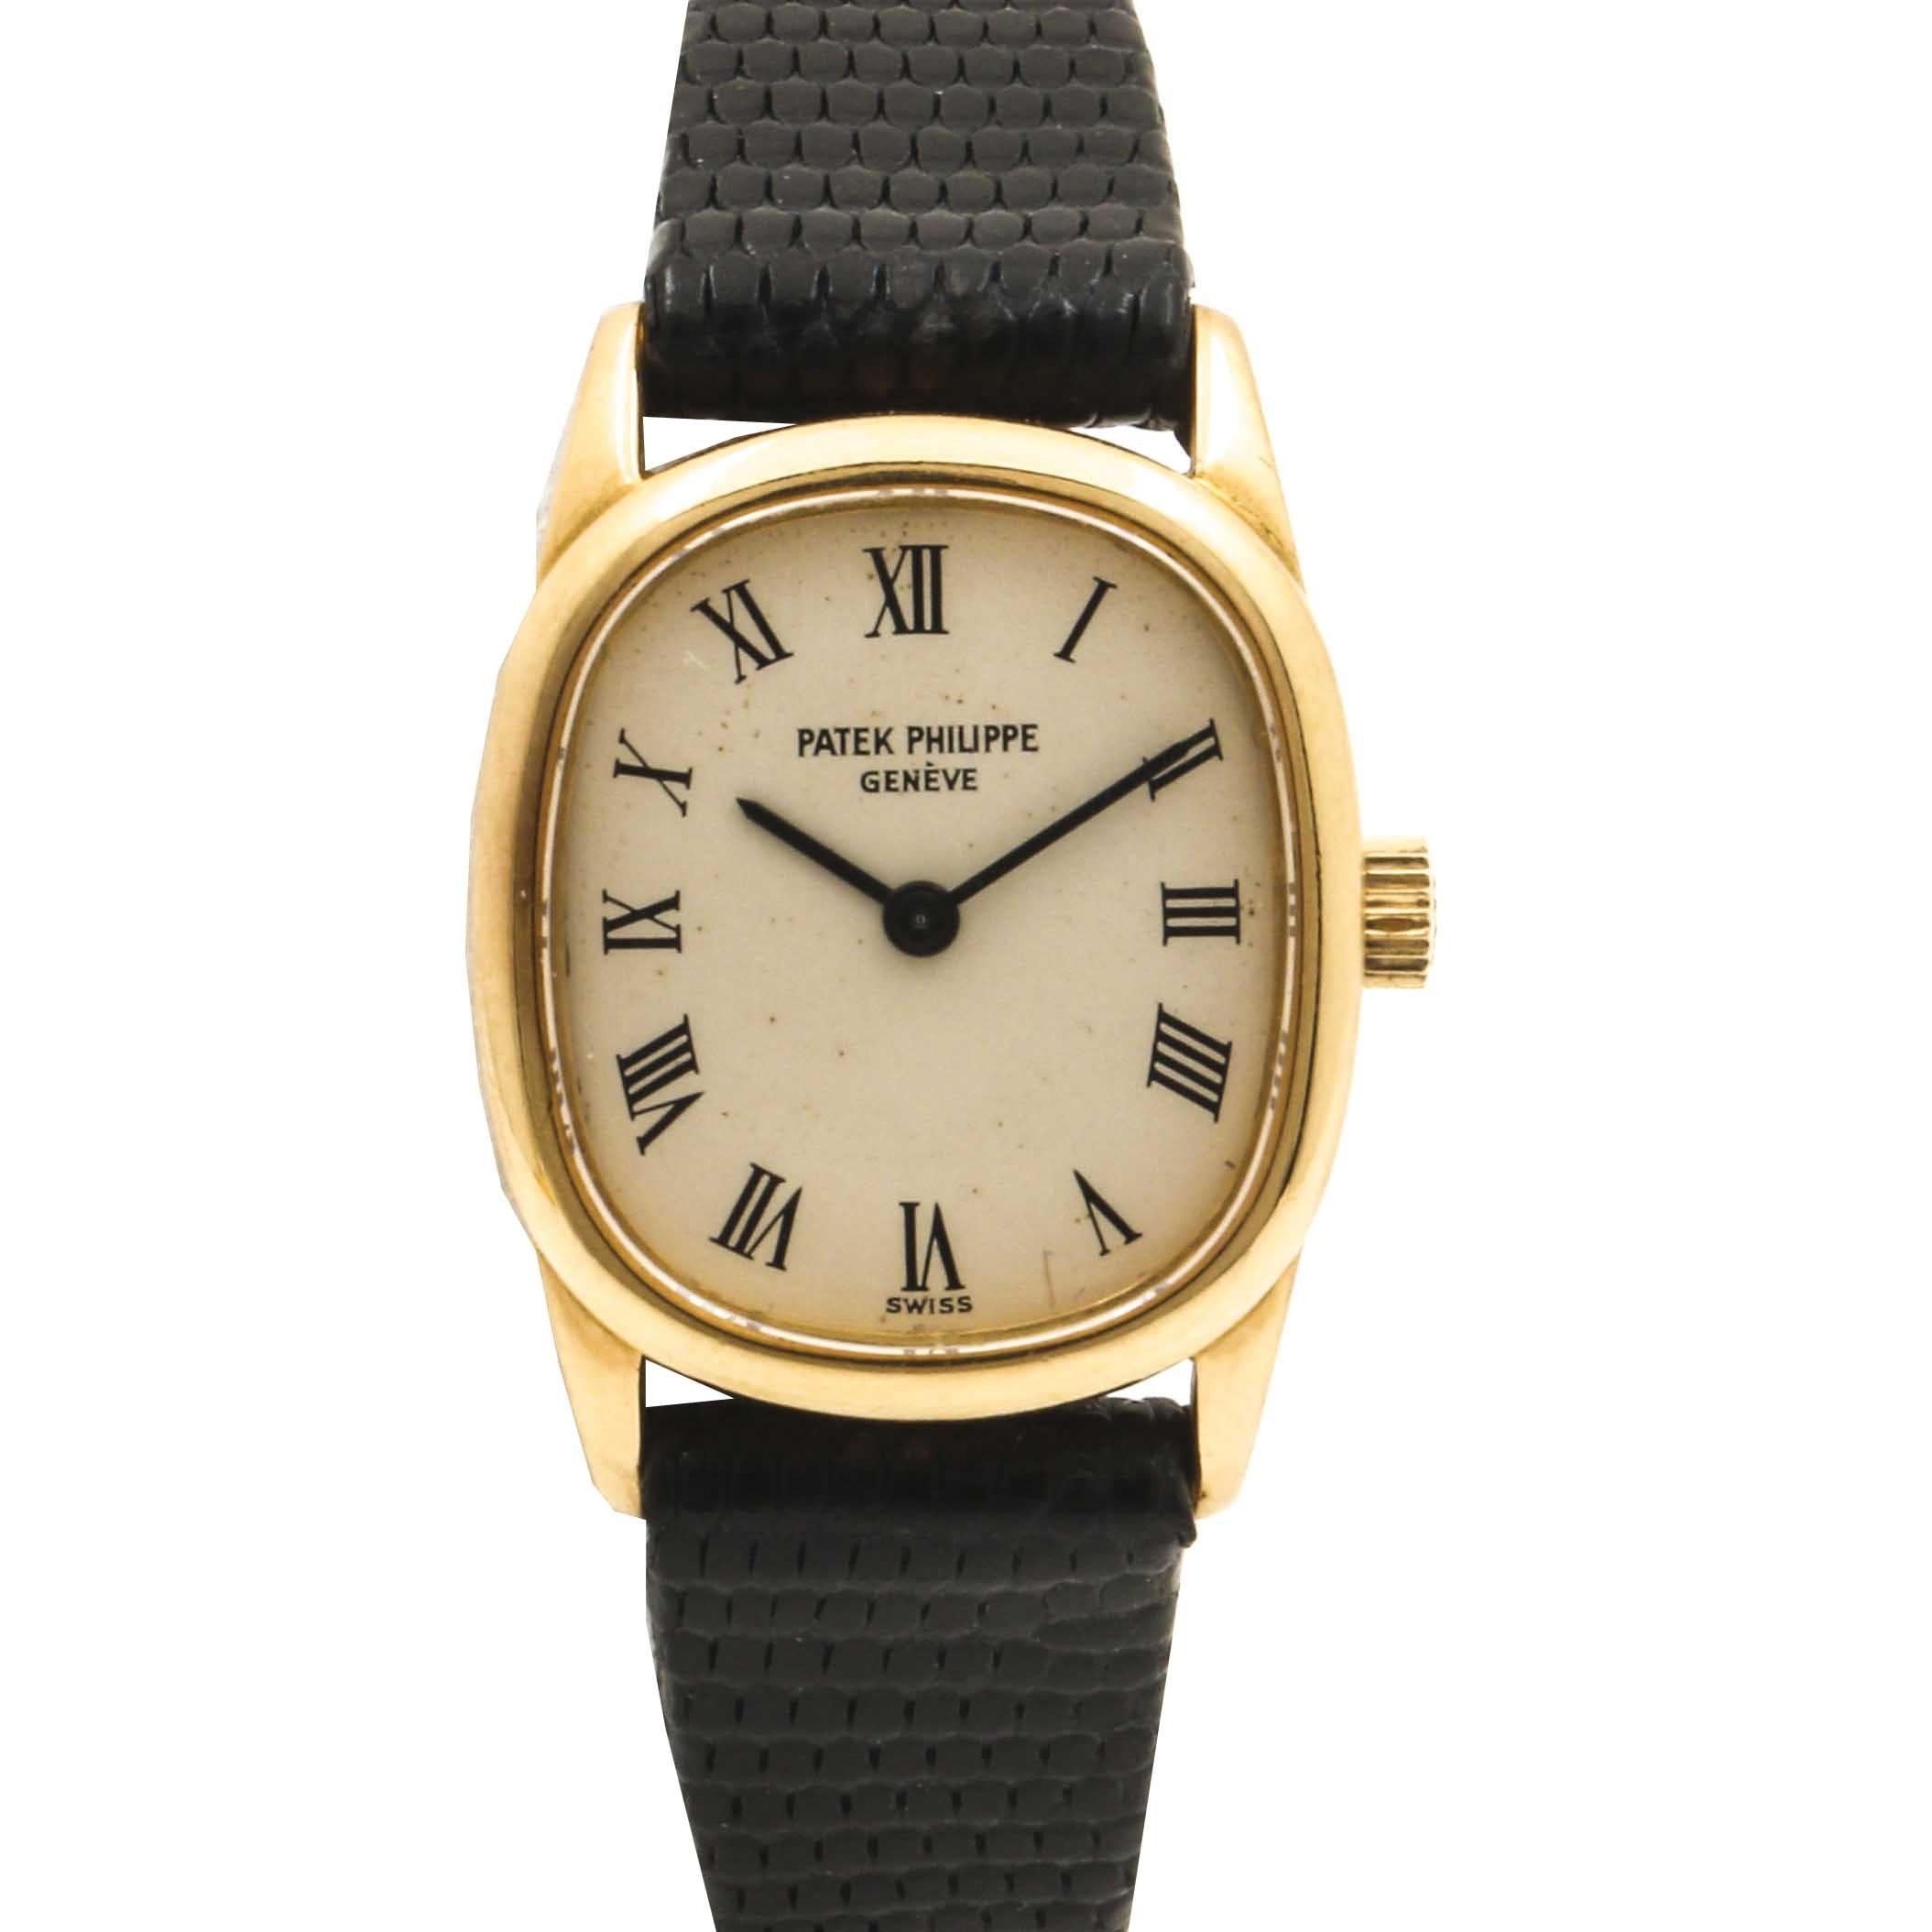 Patek Phillipe 18K Yellow Gold Wristwatch